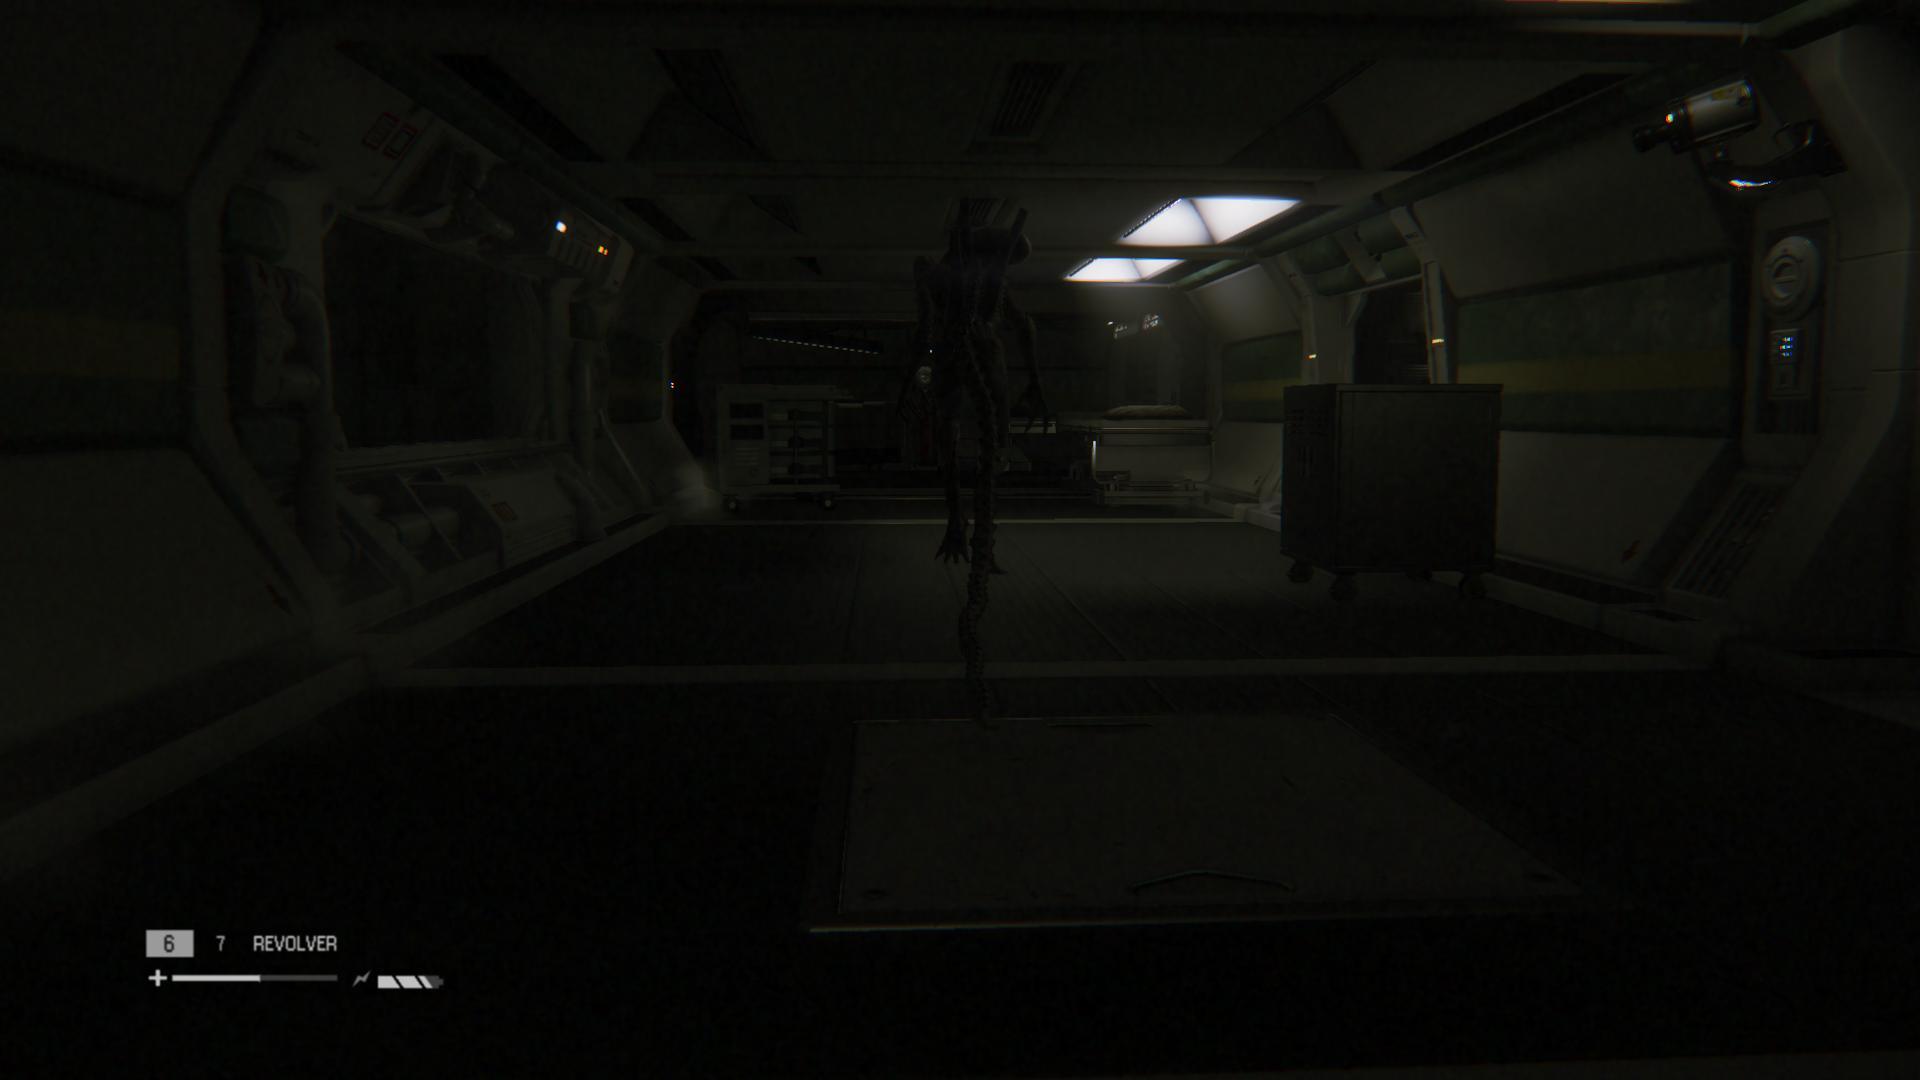 Recenze Alien: Isolation - Patnáct hodin v izolaci 9614